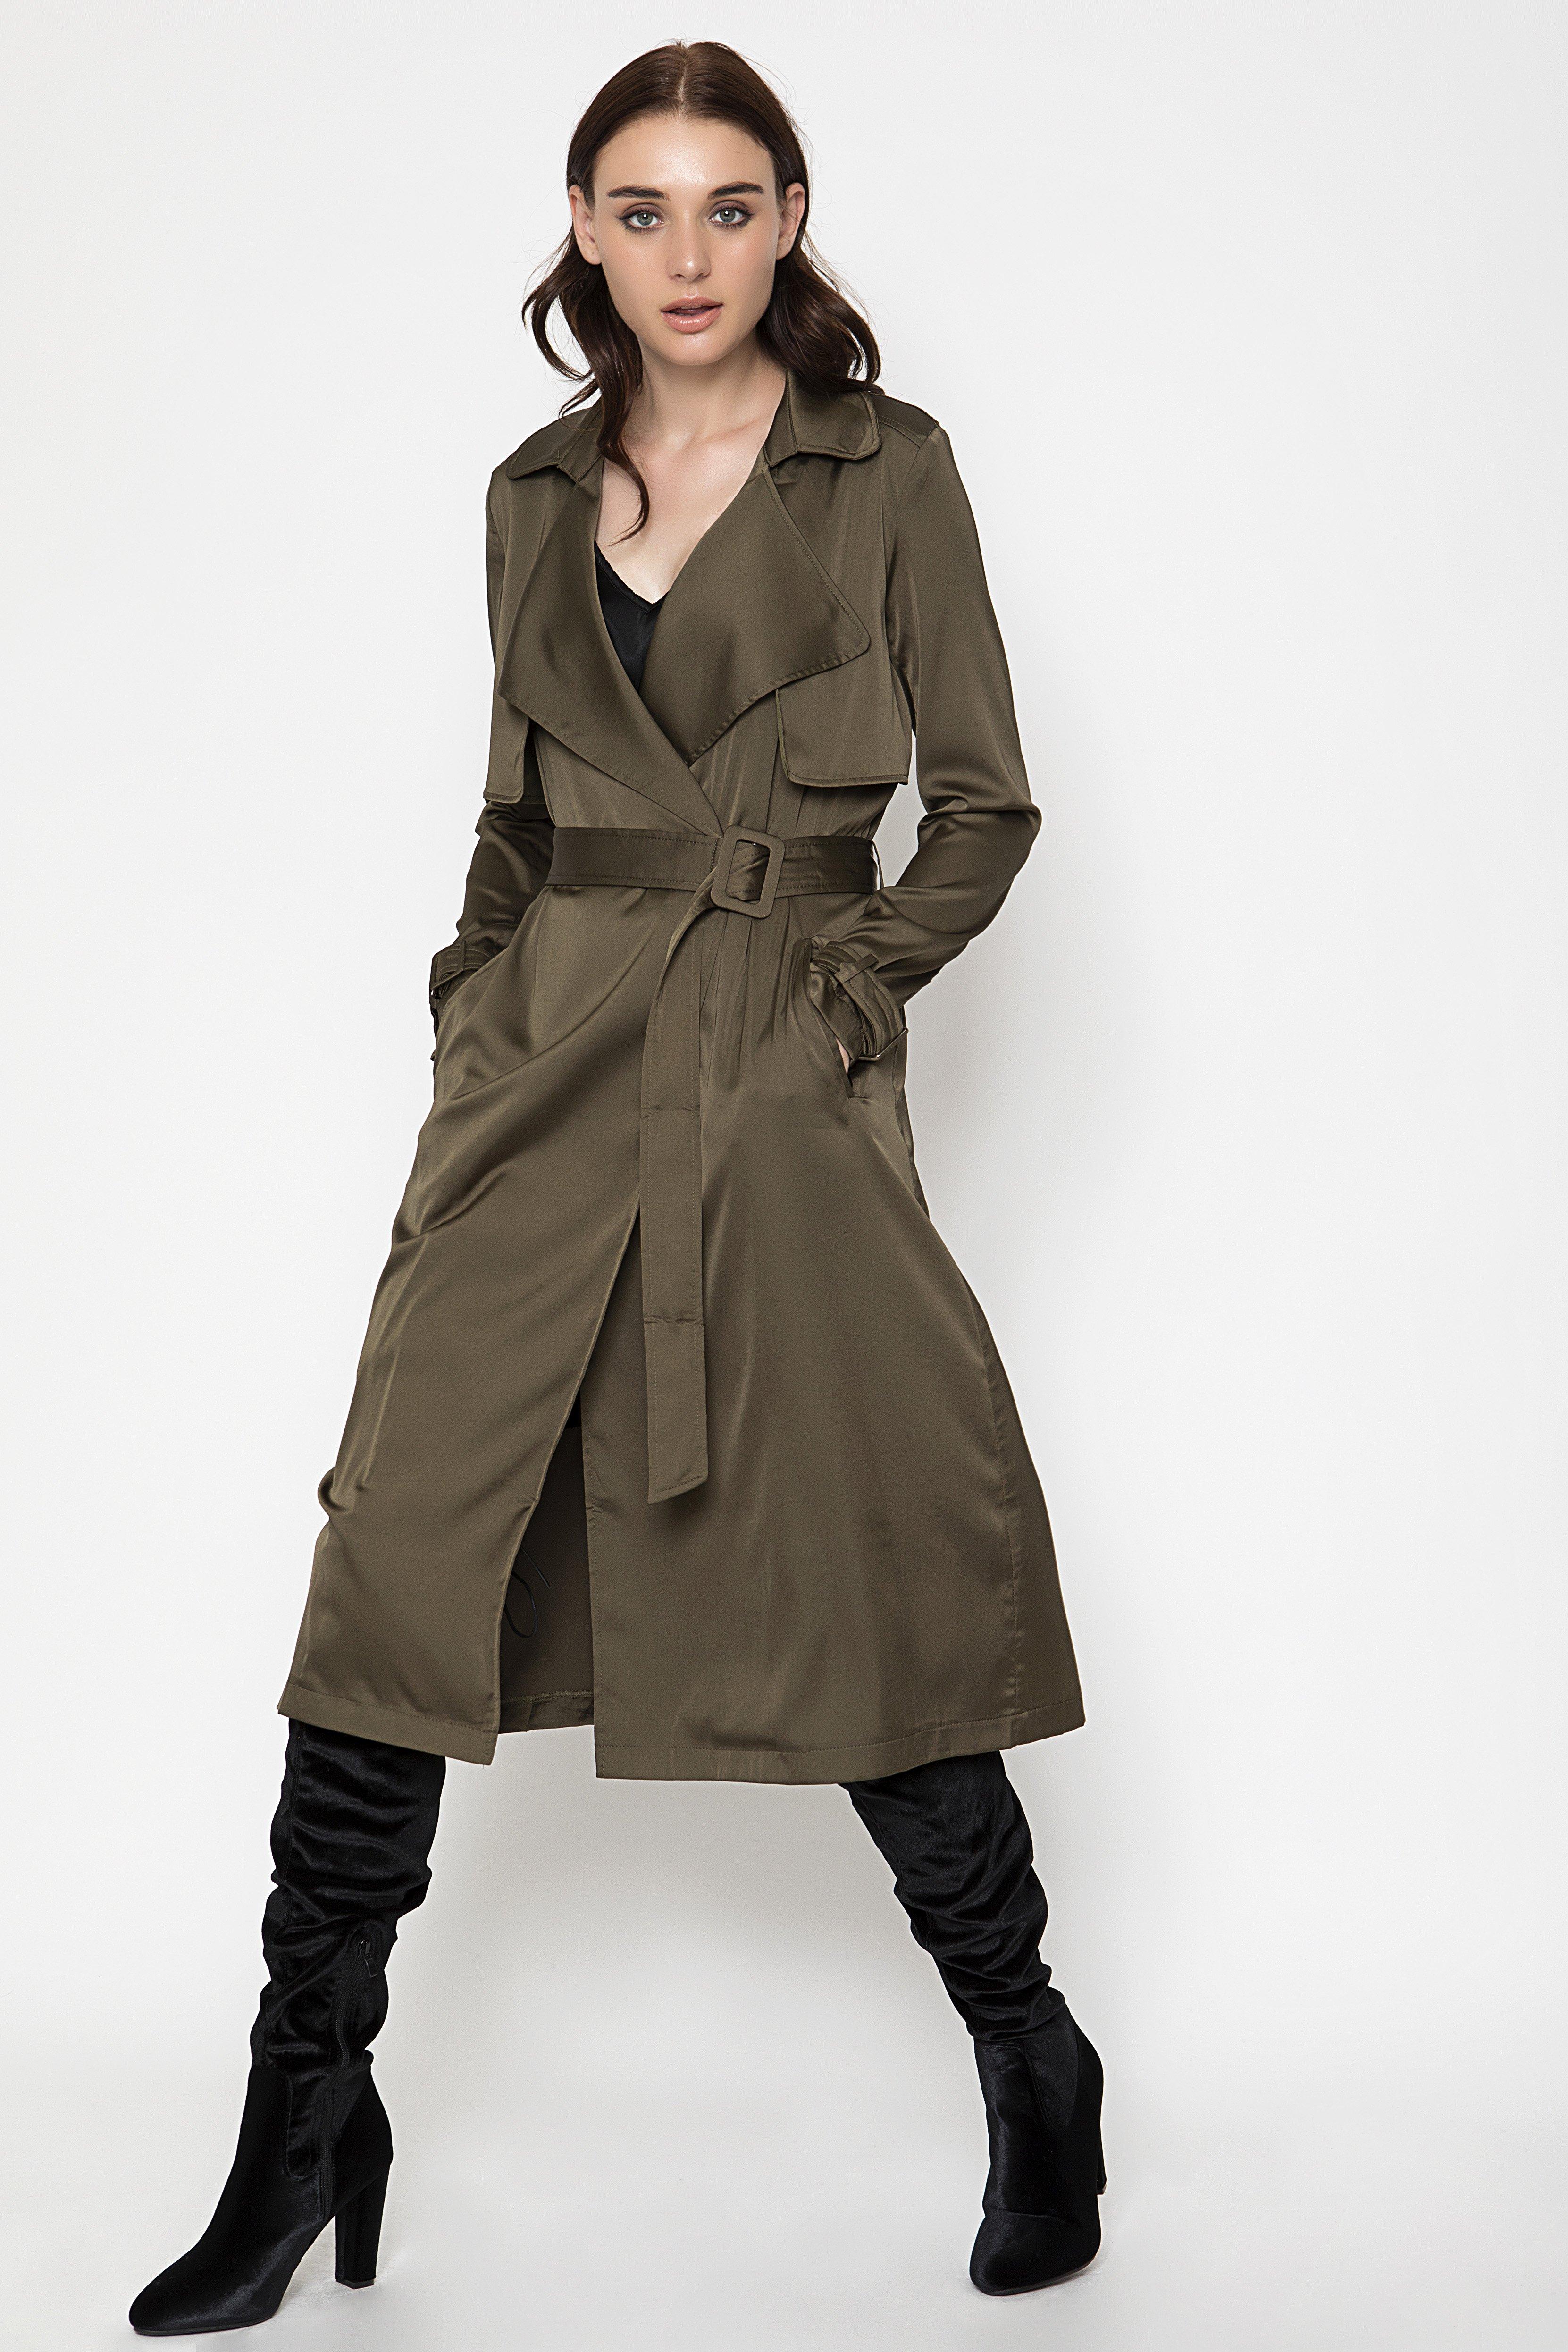 SATIN ΚΑΜΠΑΡΝΤΙΝΑ - Χακί clothes   jackets   παλτό   μπουφάν